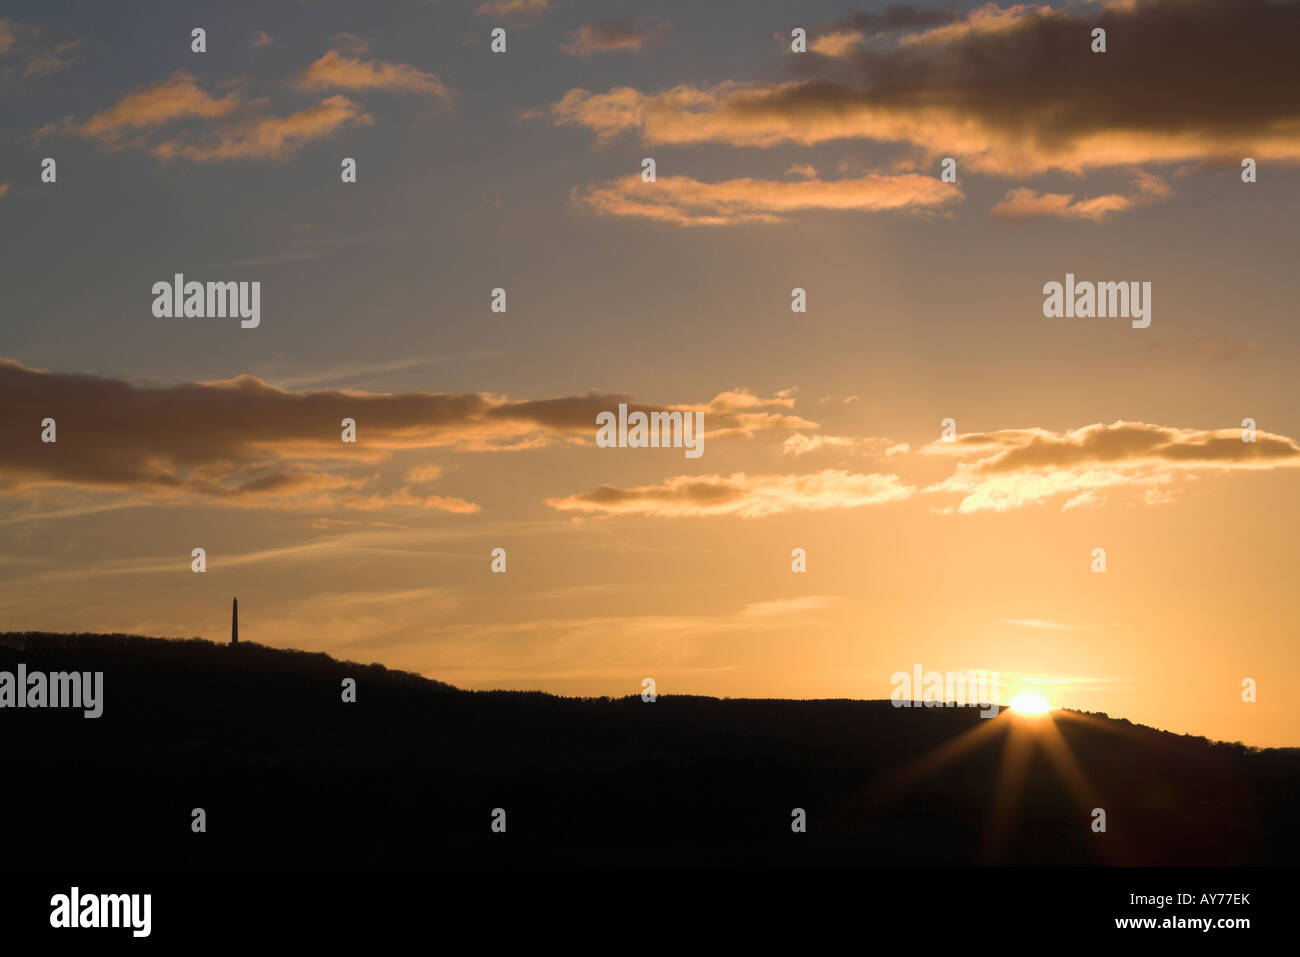 Wellington Monument at sunset, Blackdown Hills, Somerset, England, UK - Stock Image